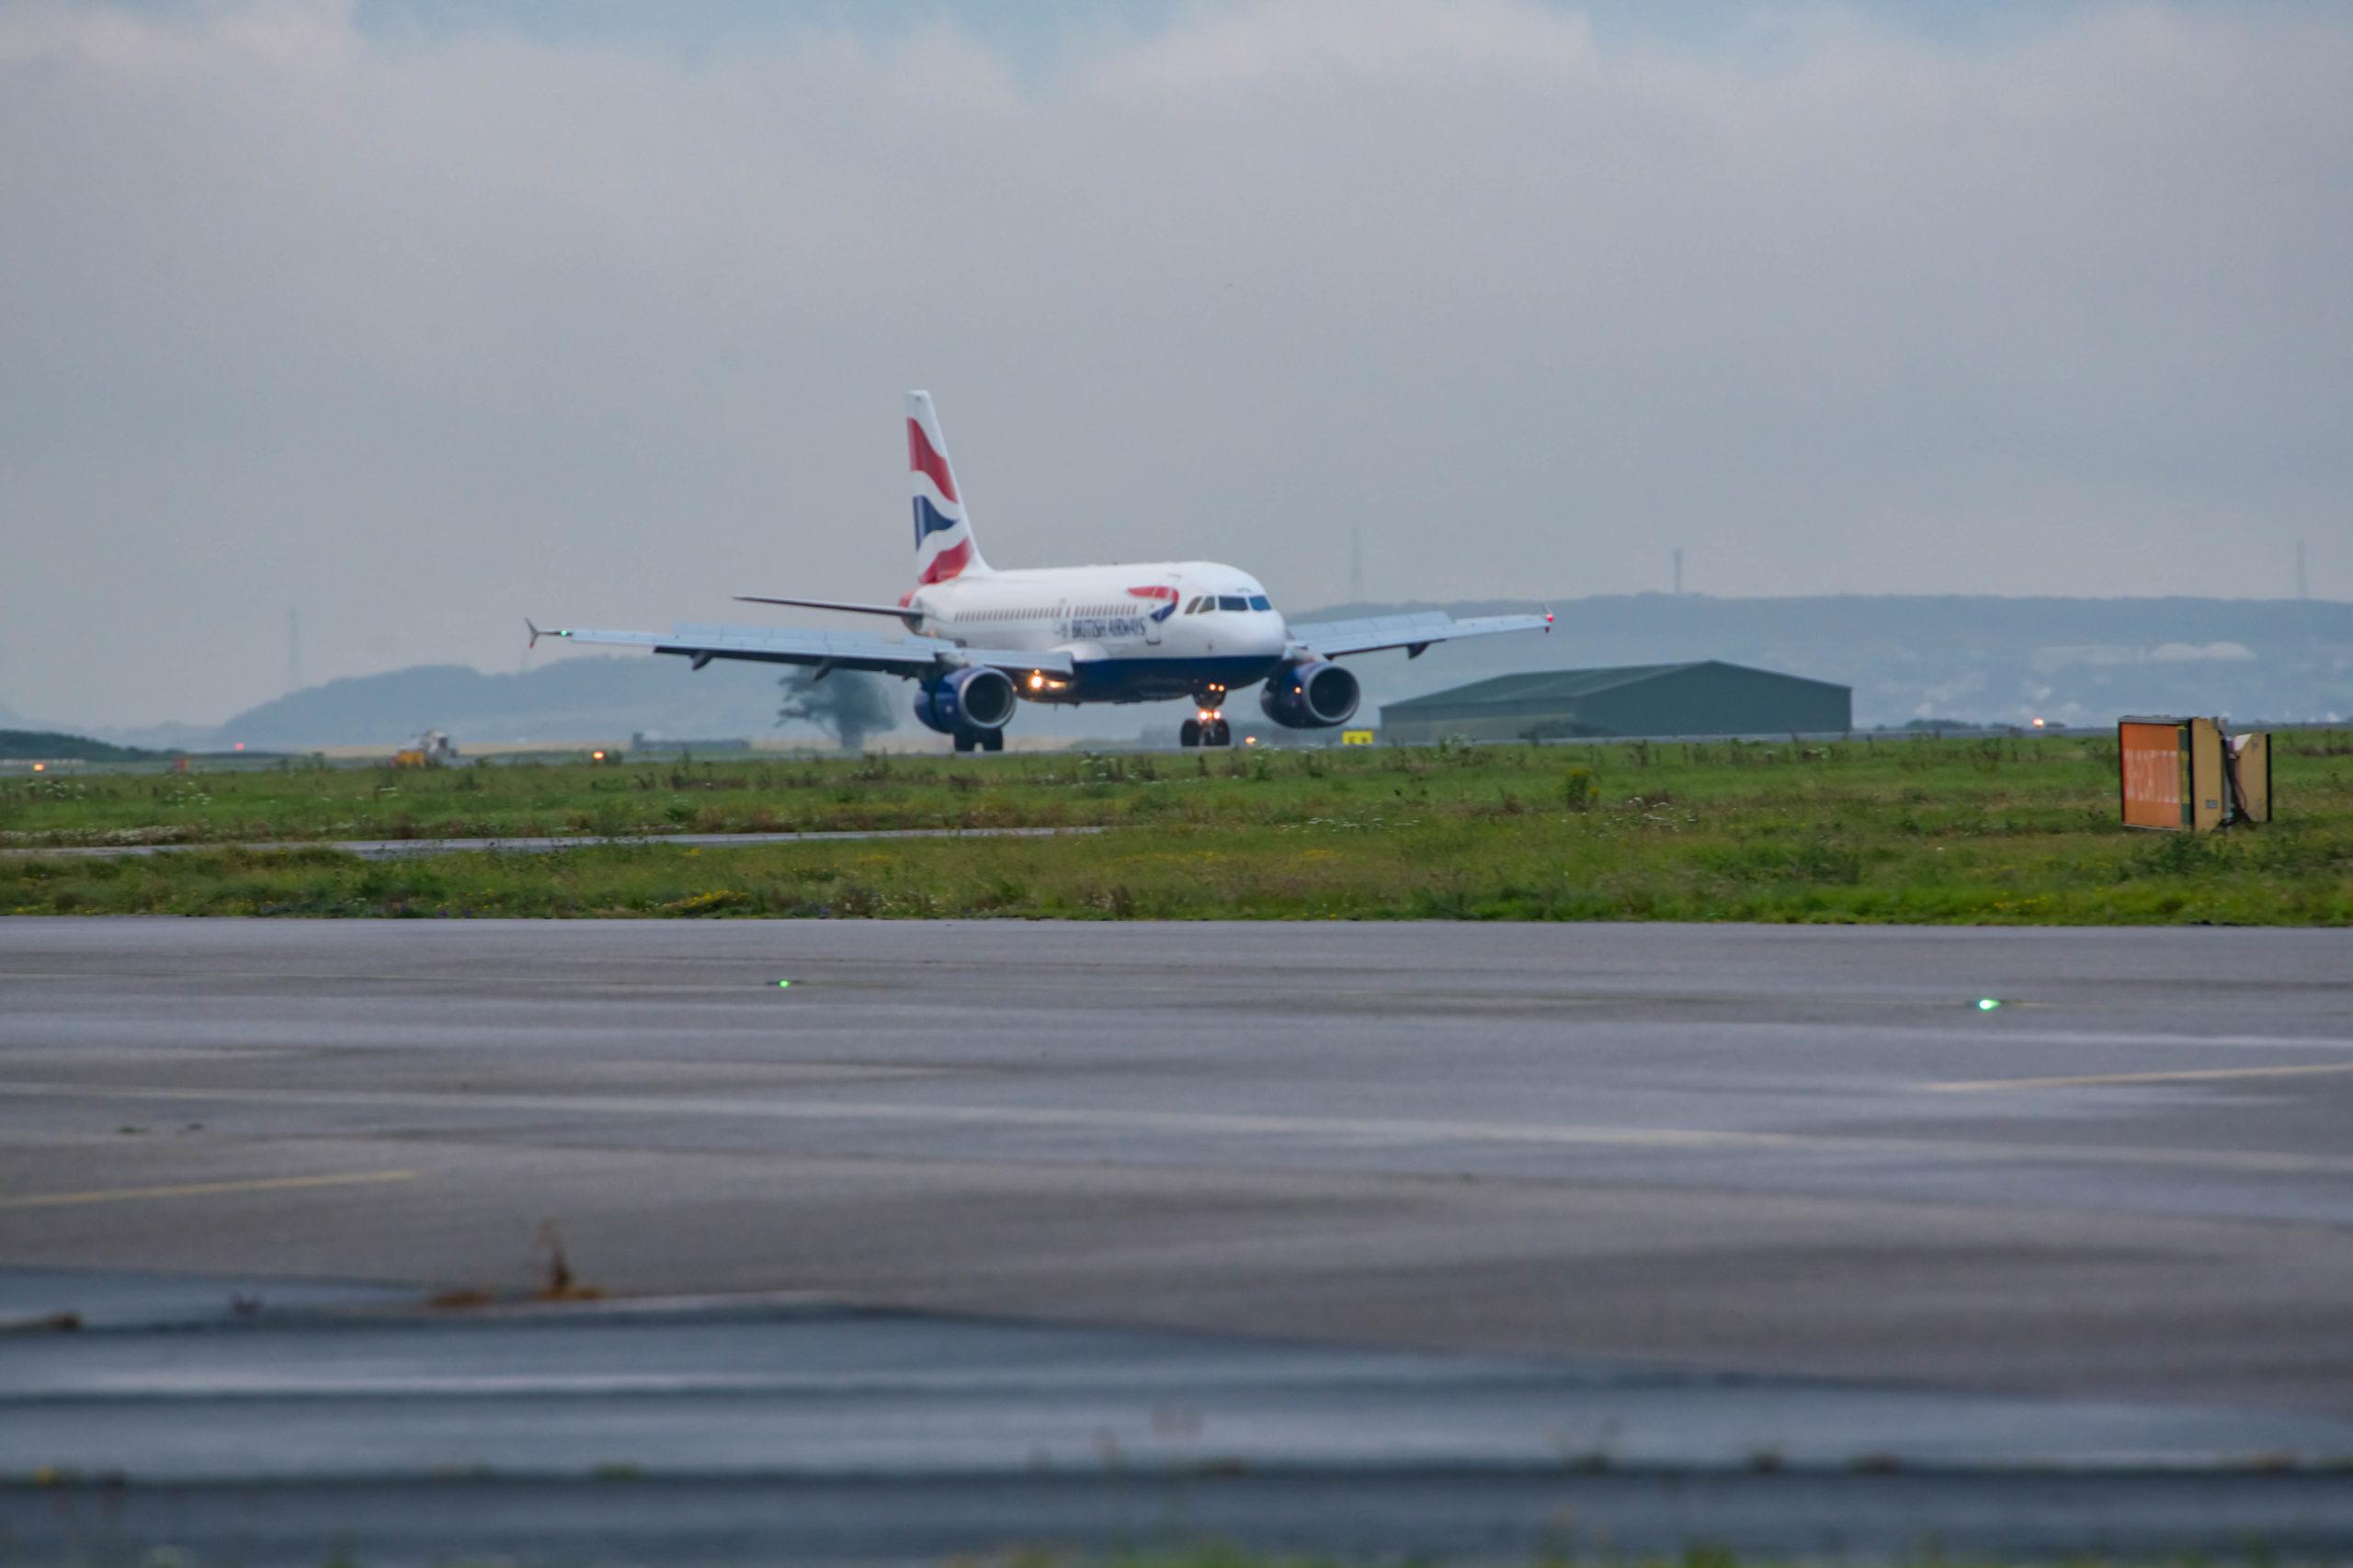 A British Airways landing at Cornwall Airport